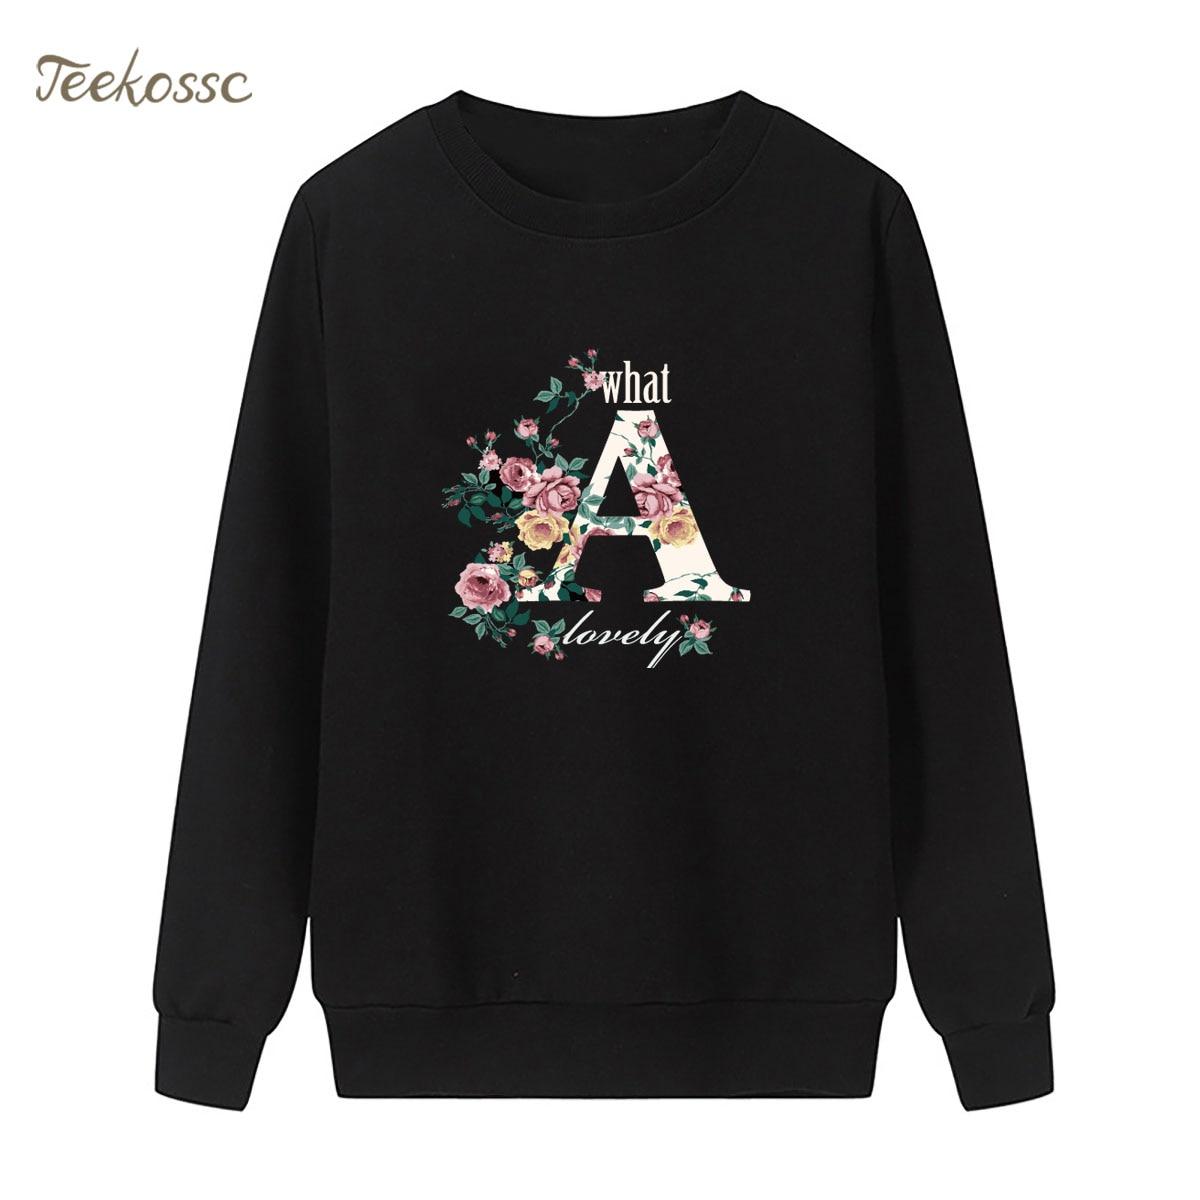 Flowers A Sweatshirt Print Hoodie 2018 Brand Winter Autumn Women Lasdies Pullover Fleece Warm Loose Hipster Casual Streetwear